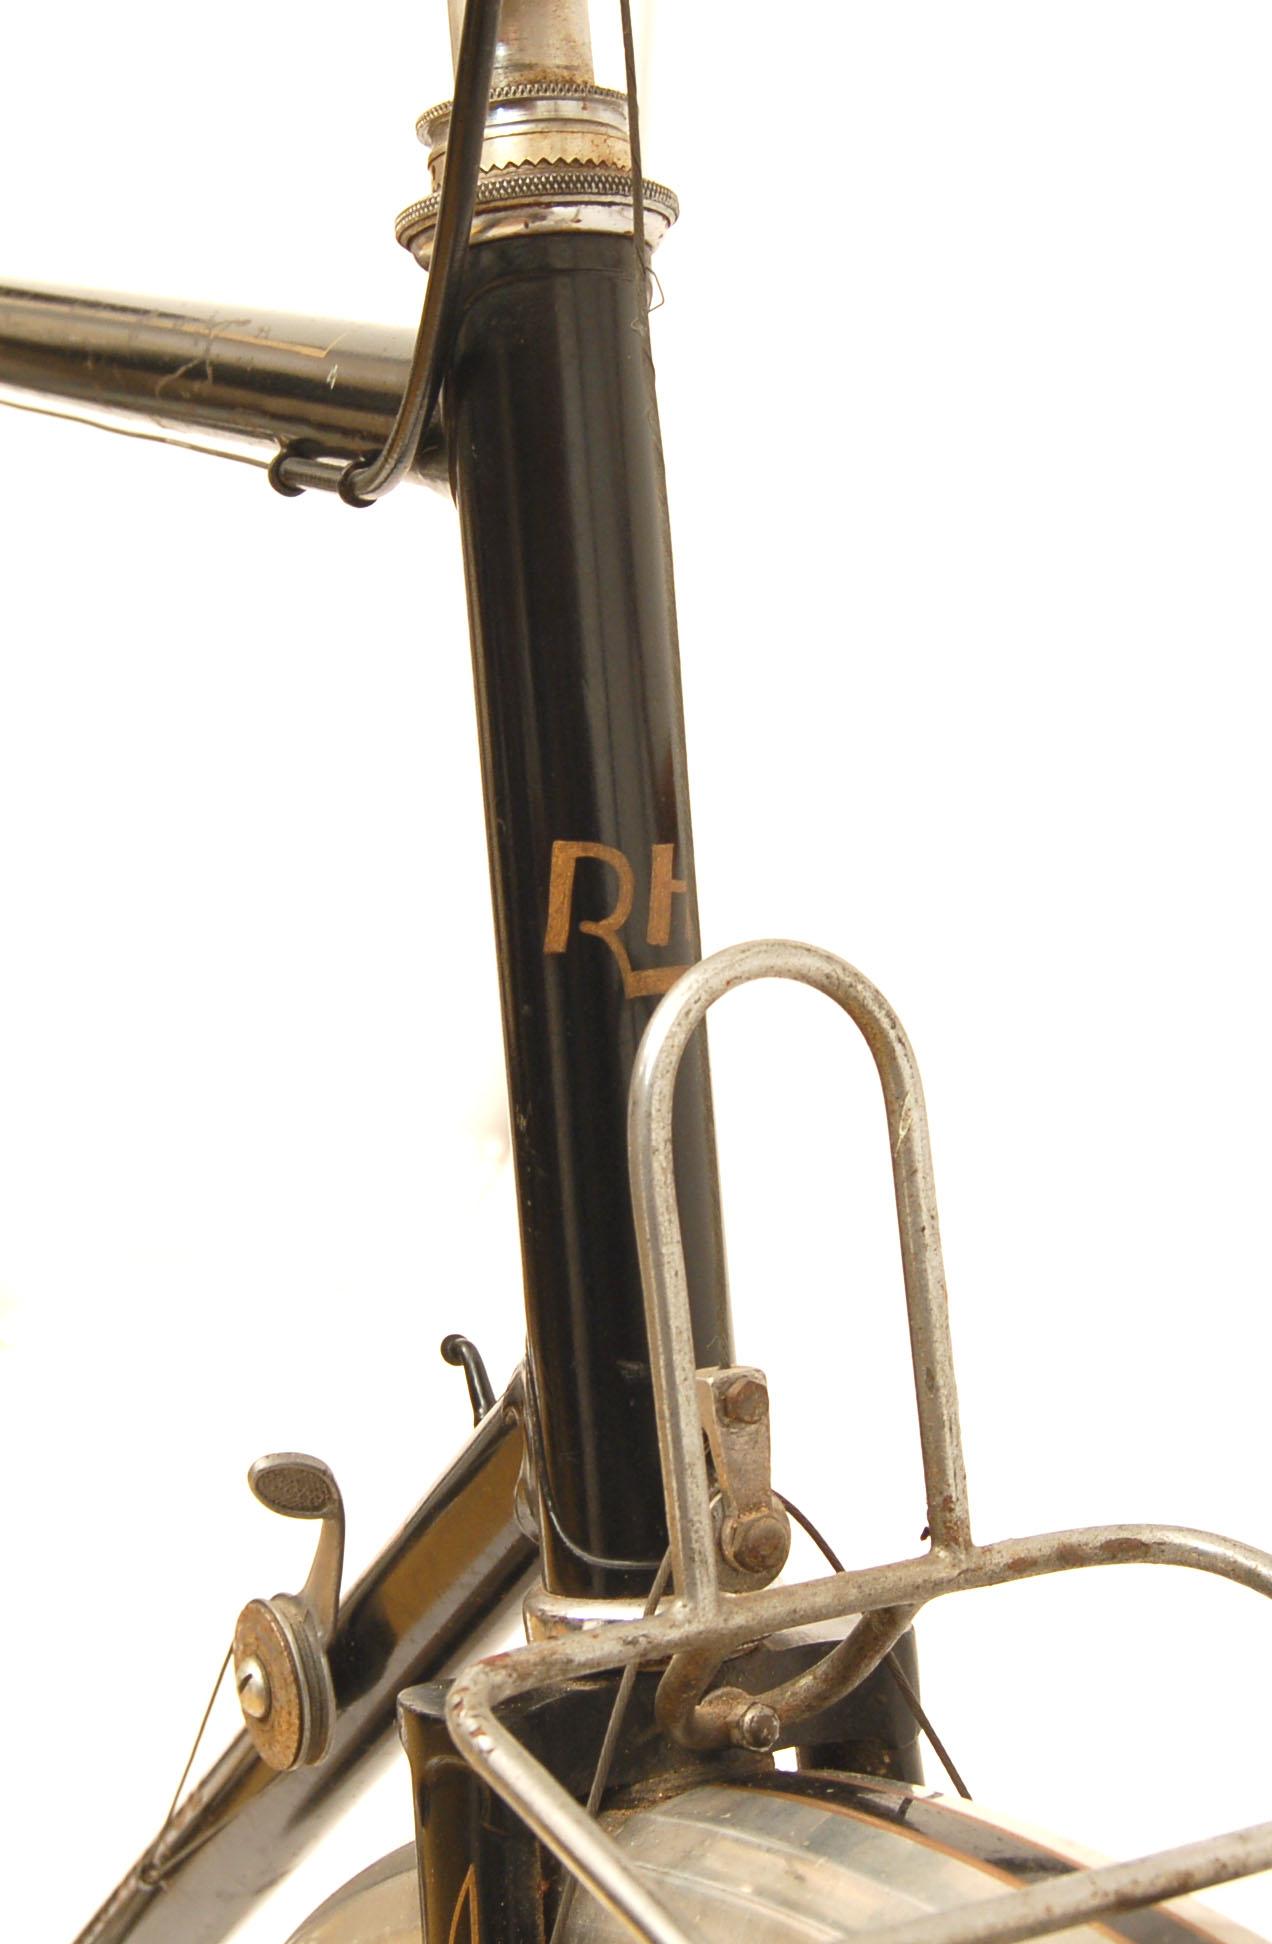 Rene Herse bicycle vélo René Herse